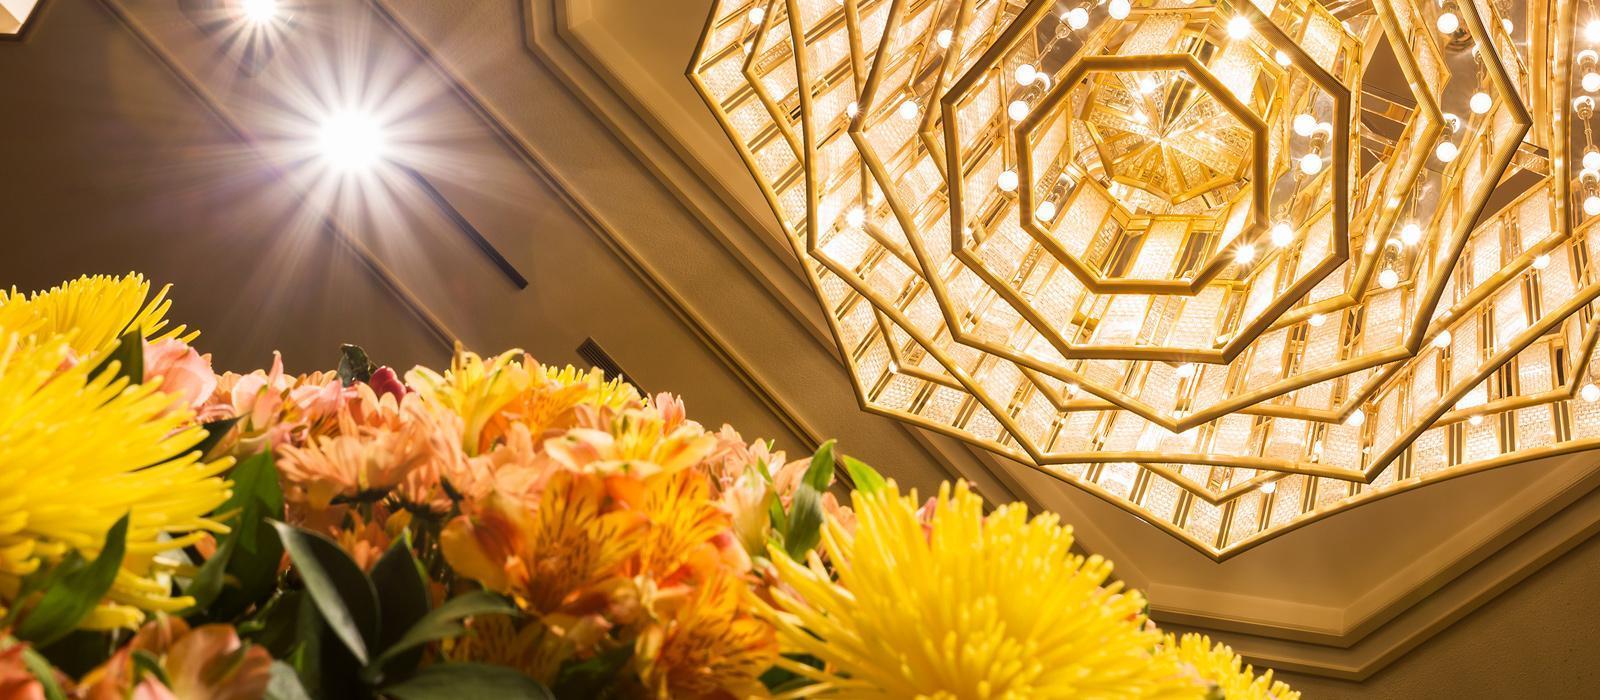 东京帝国酒店(Imperial Hotel Tokyo)【 东京,日本】 酒店  www.lhw.cn